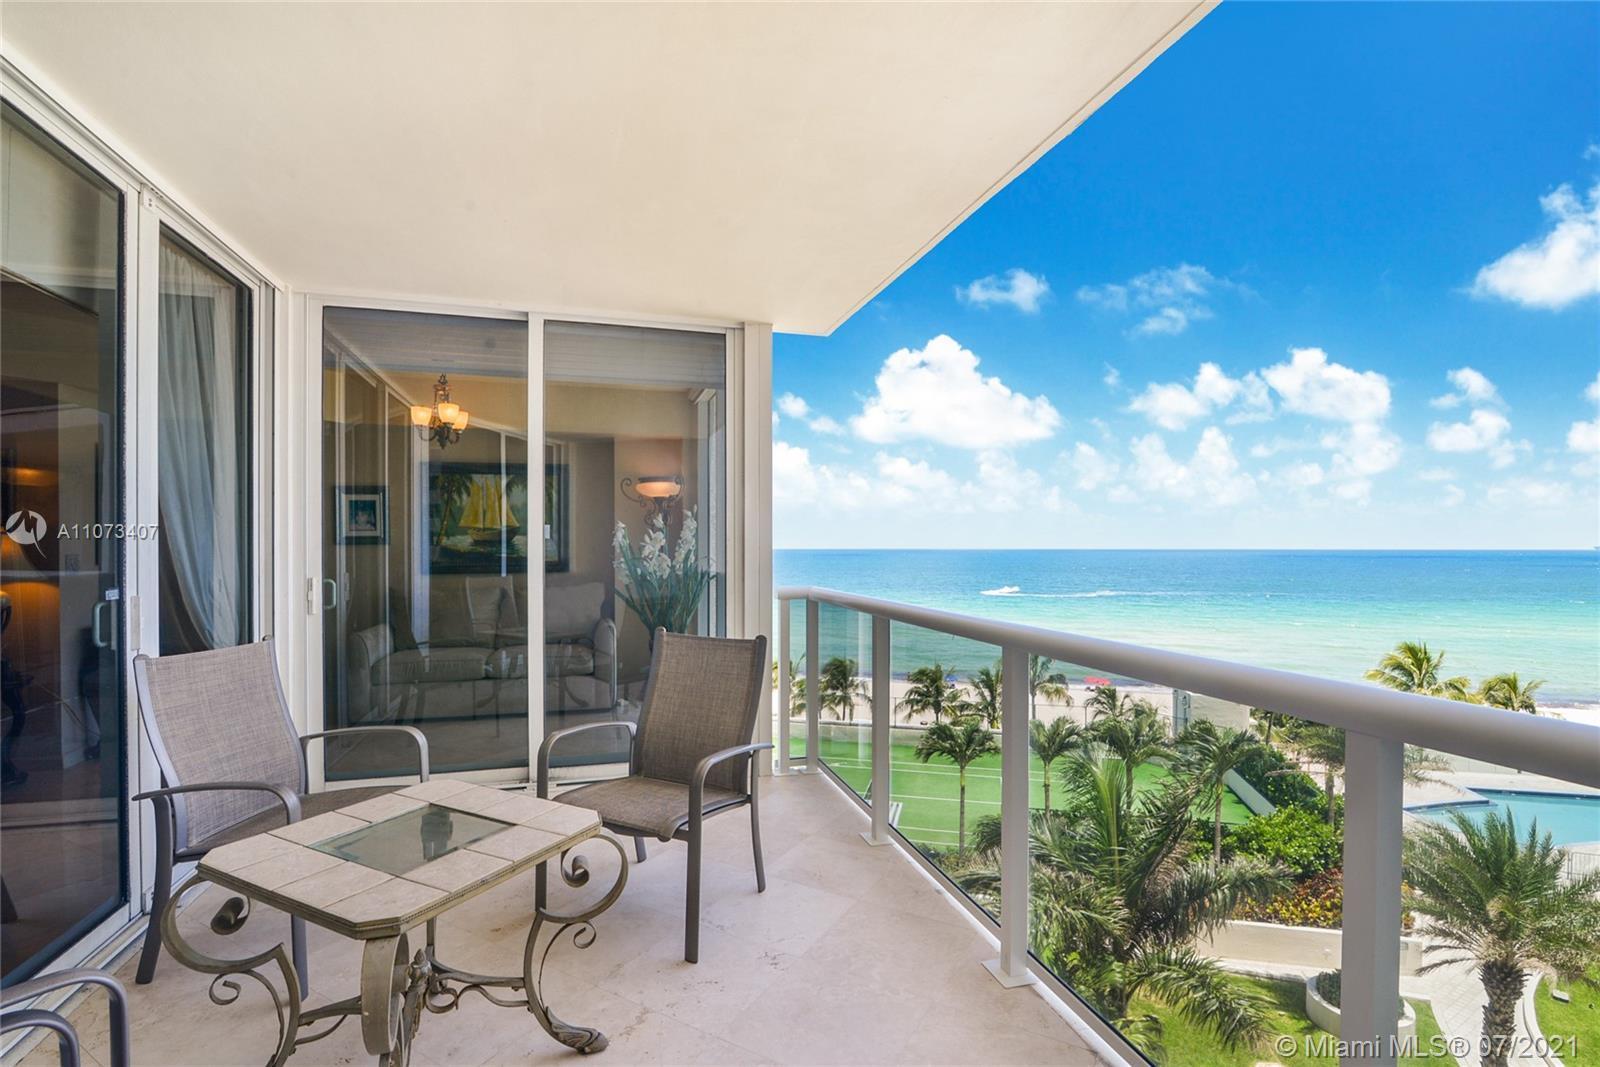 Ocean Two Condo in Sunny Isles Beach stunning 2 bedroom/2.5 bath + den unit with breathtaking ocean